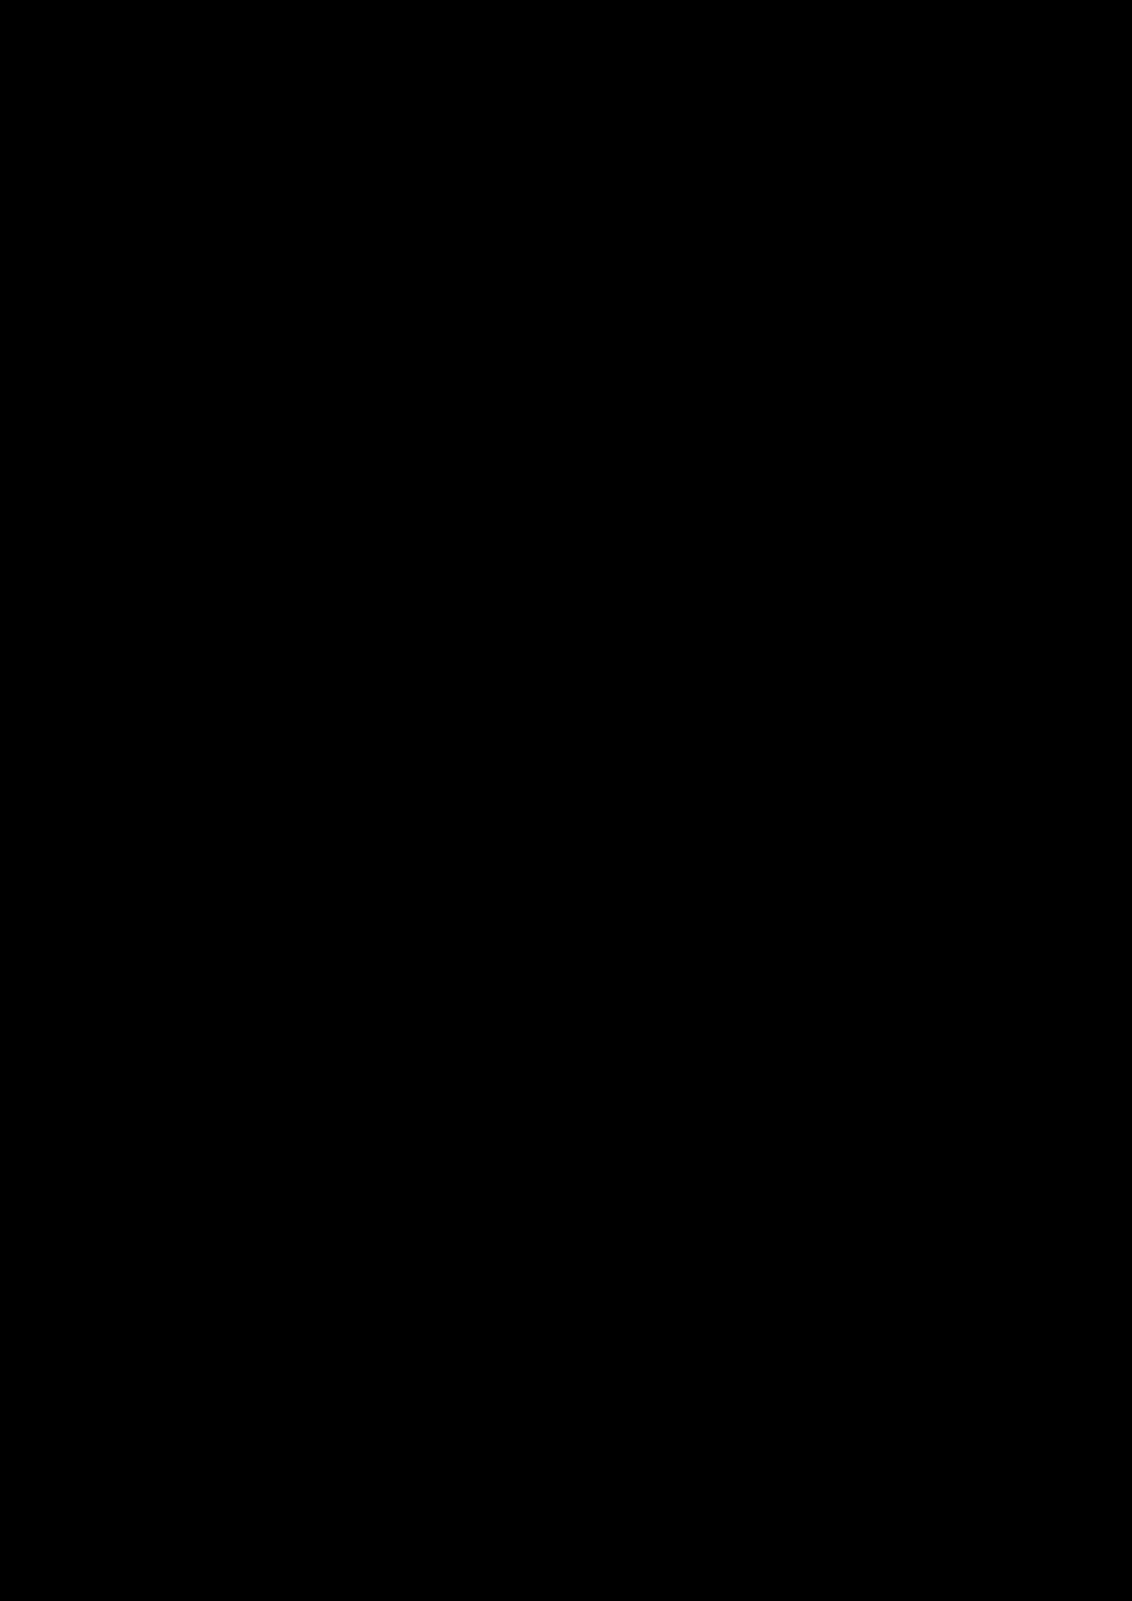 Mrs. Vandebilt slide, Image 61